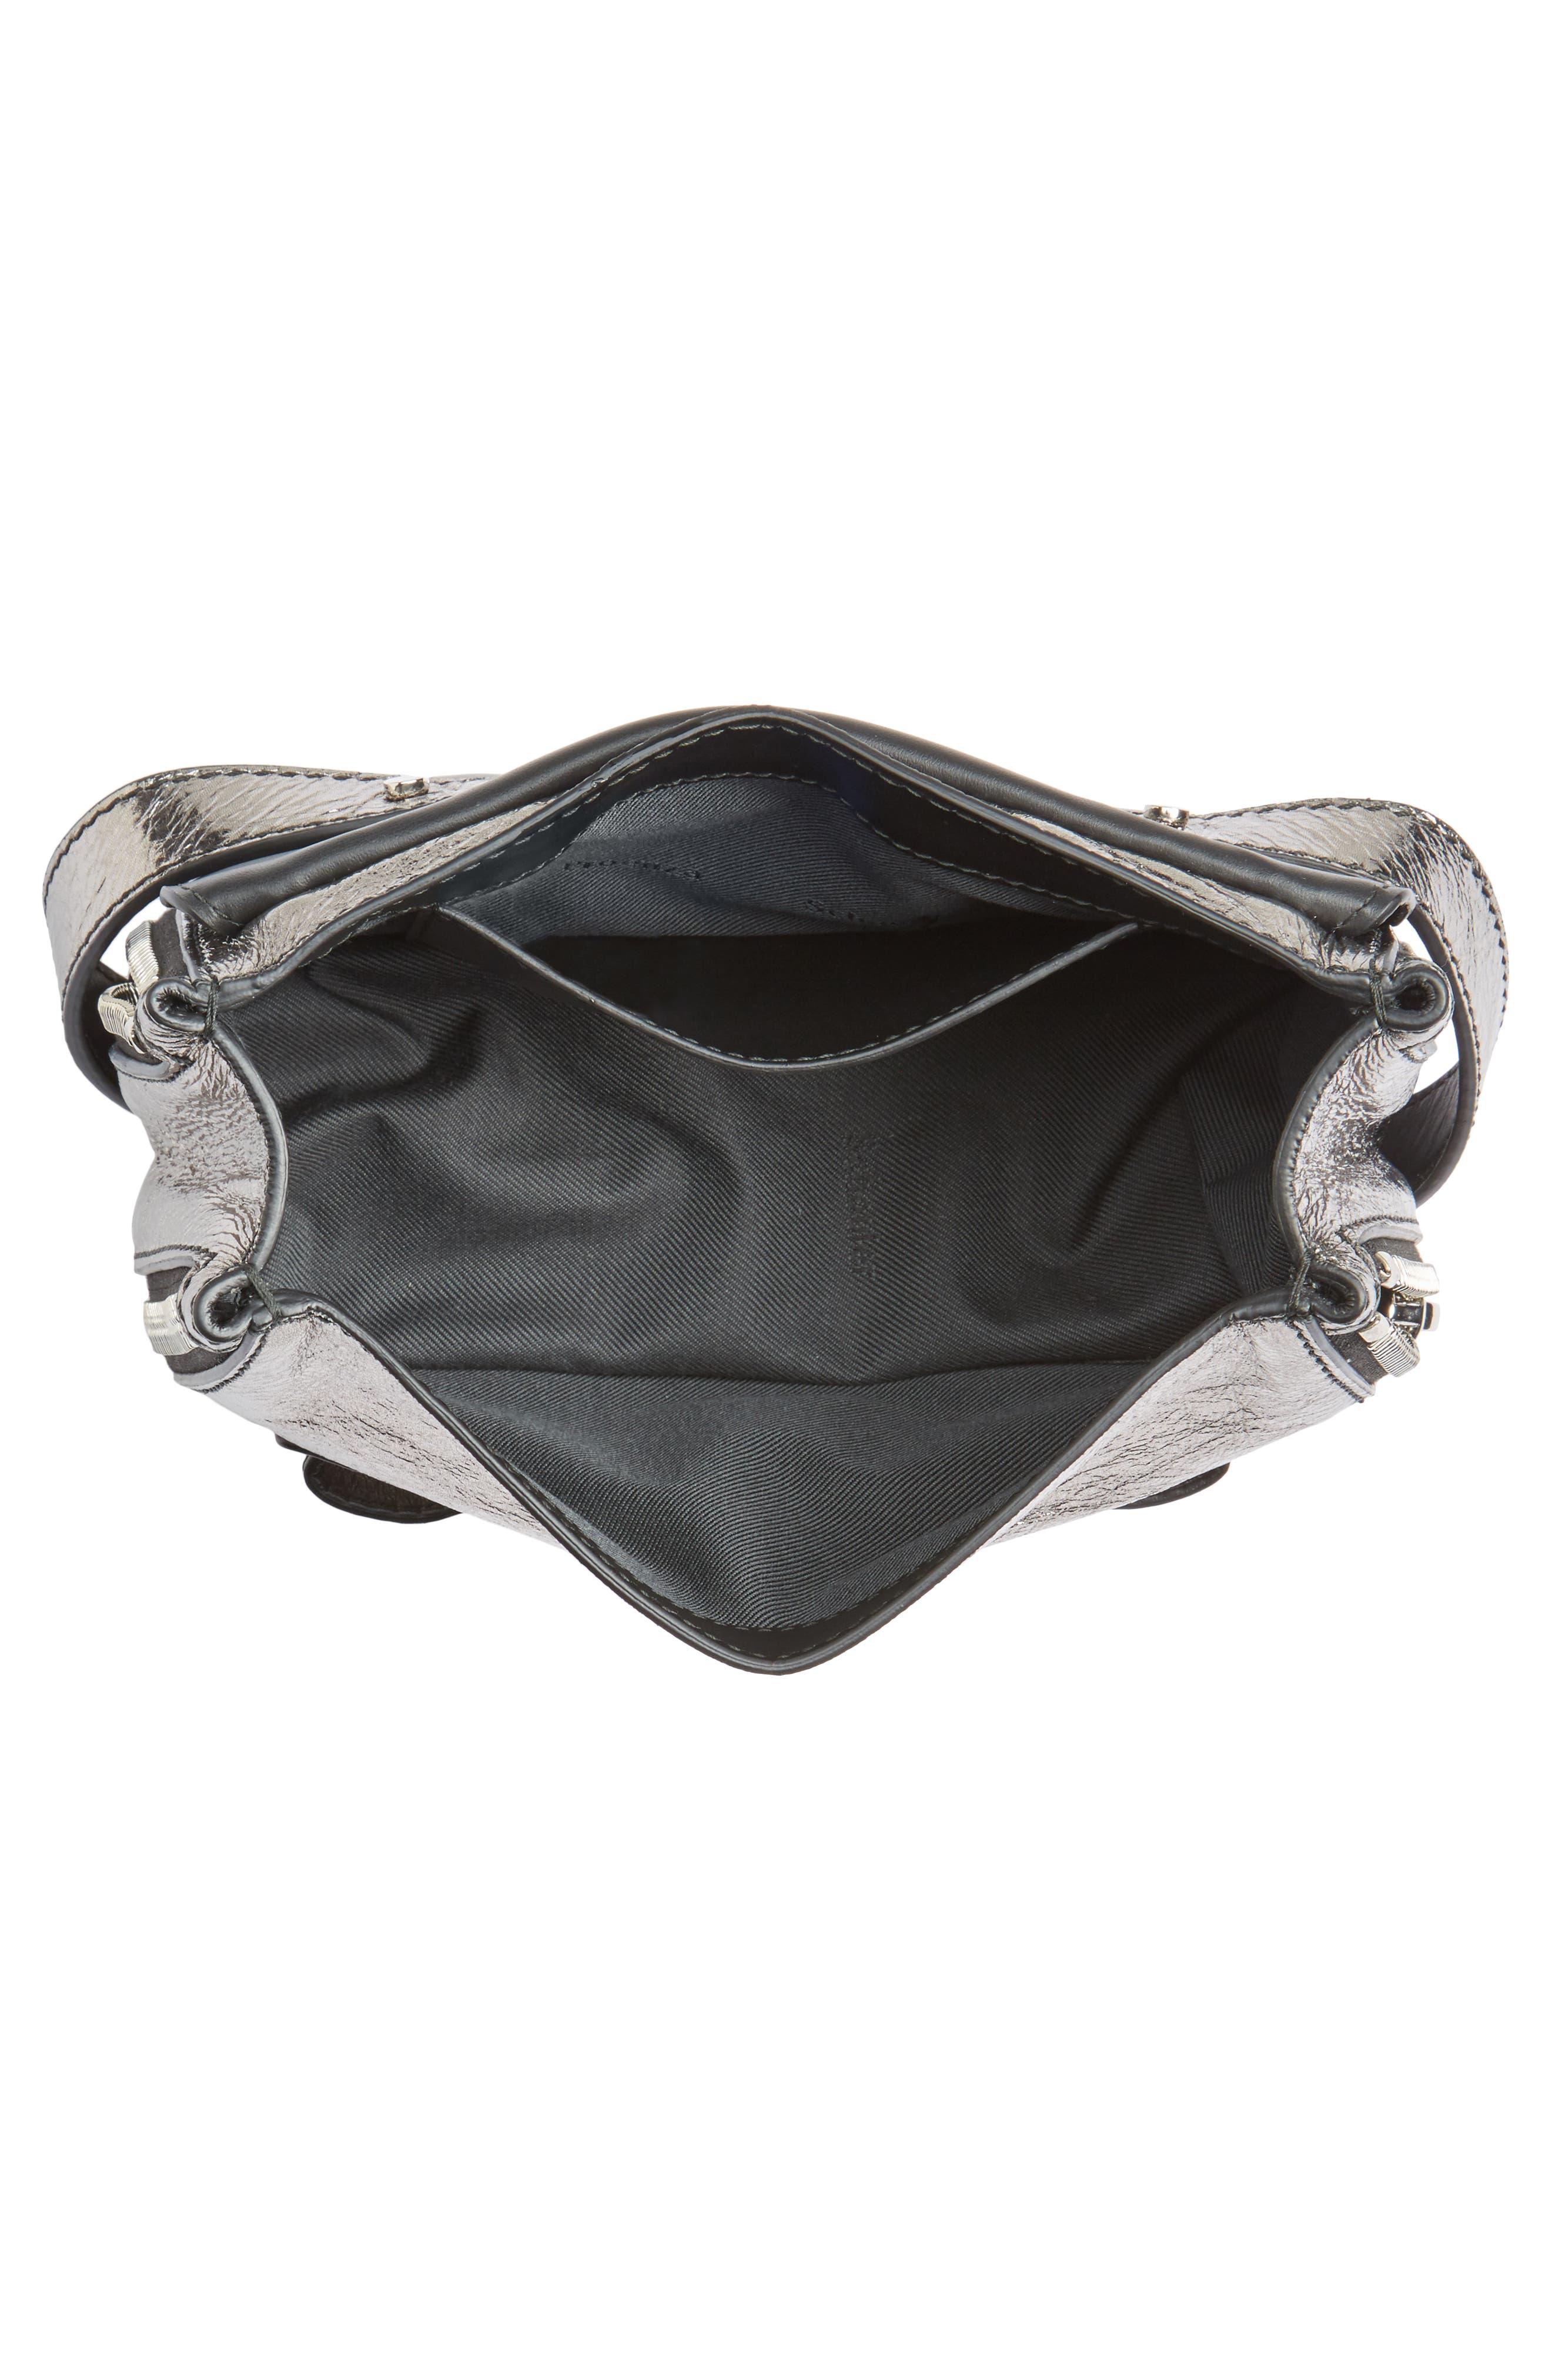 Mini PS1 Metallic Leather Crossbody Bag,                             Alternate thumbnail 4, color,                             040